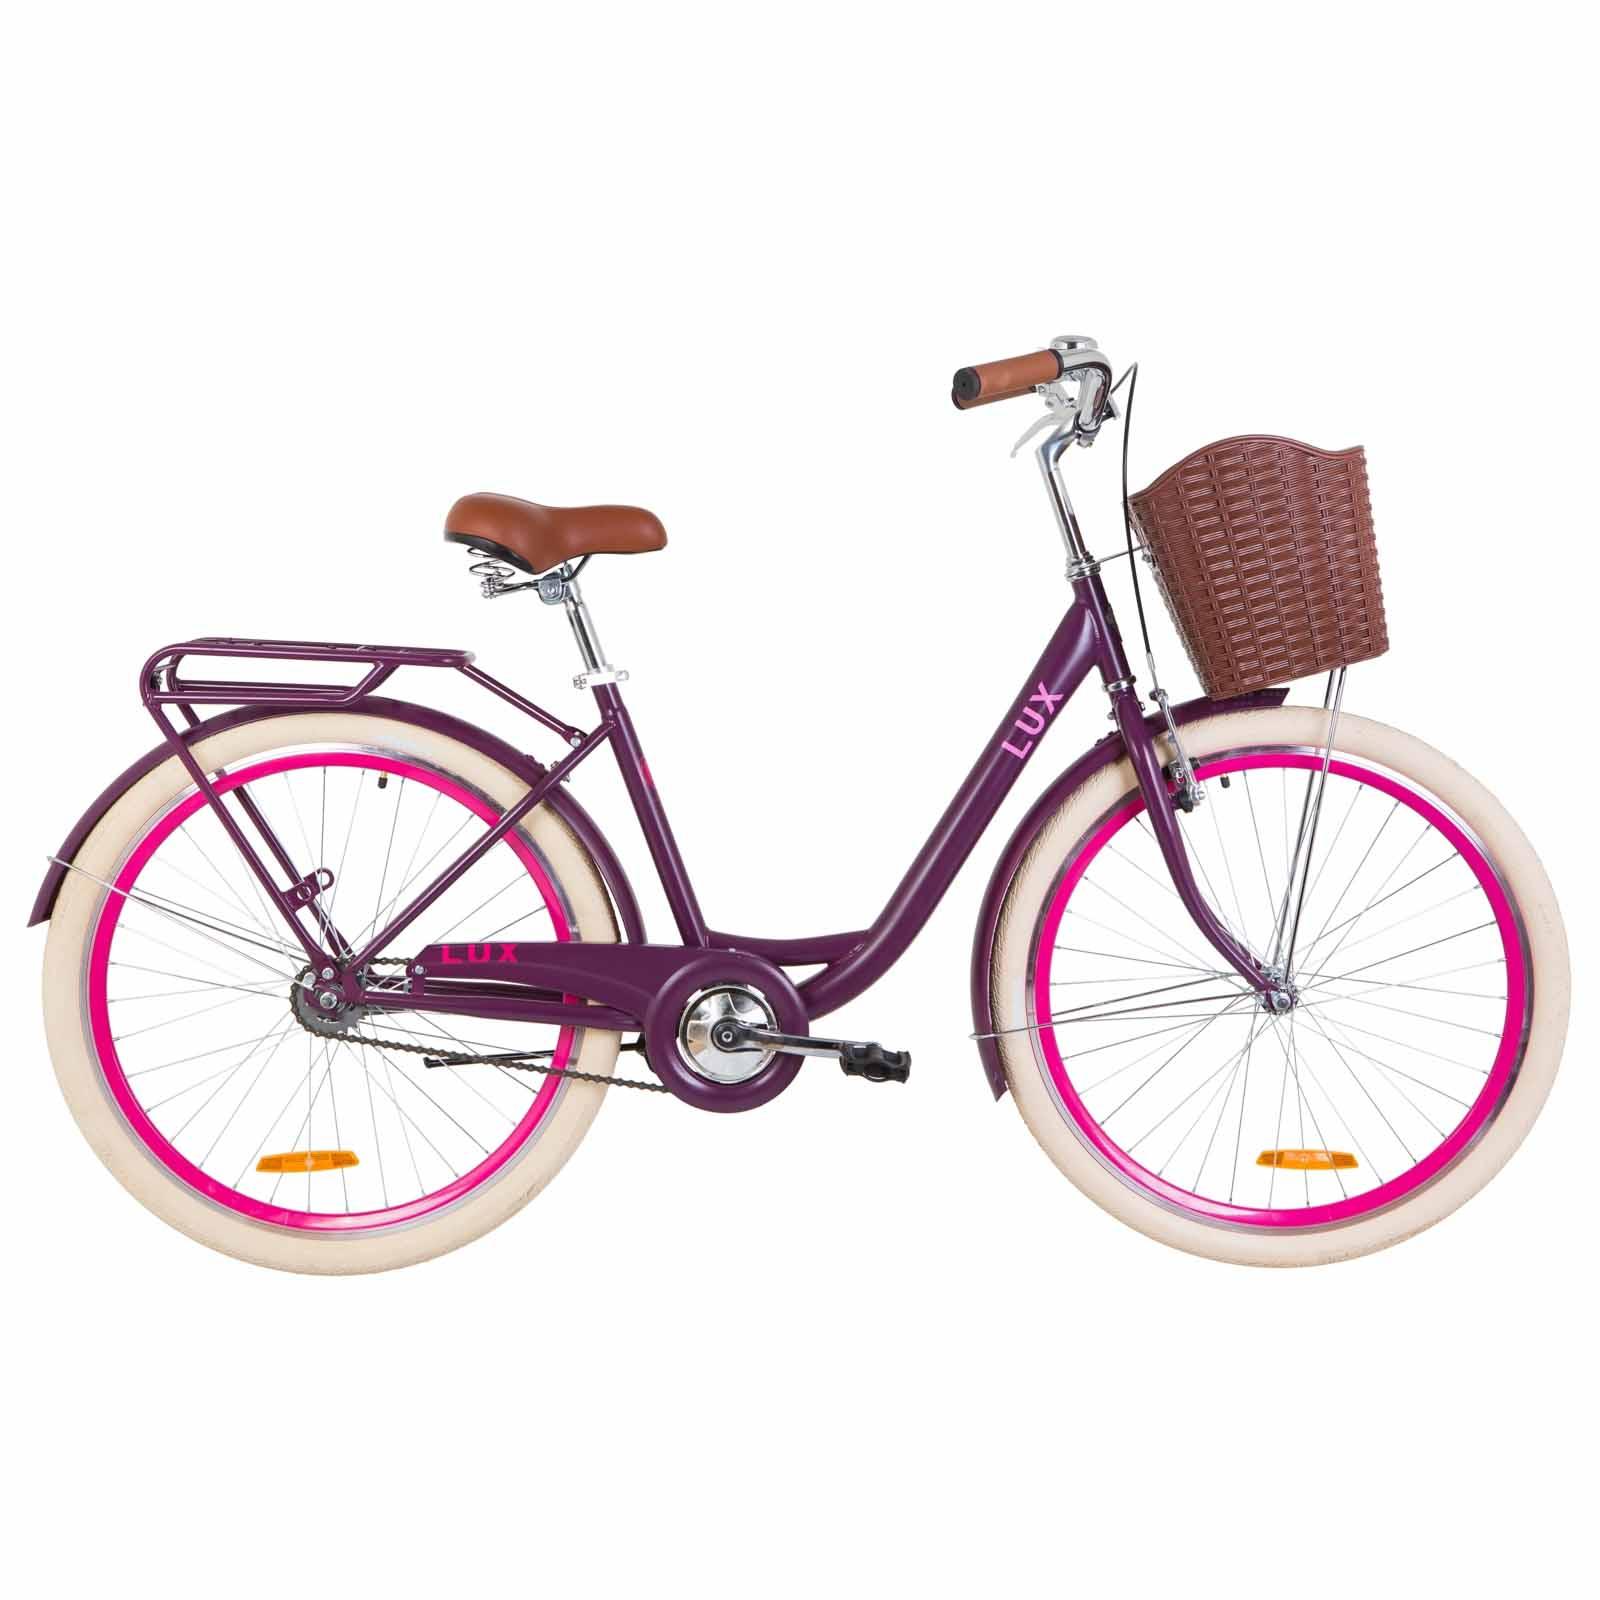 Фото Велосипед 26 Dorozhnik LUX сливовый 2019